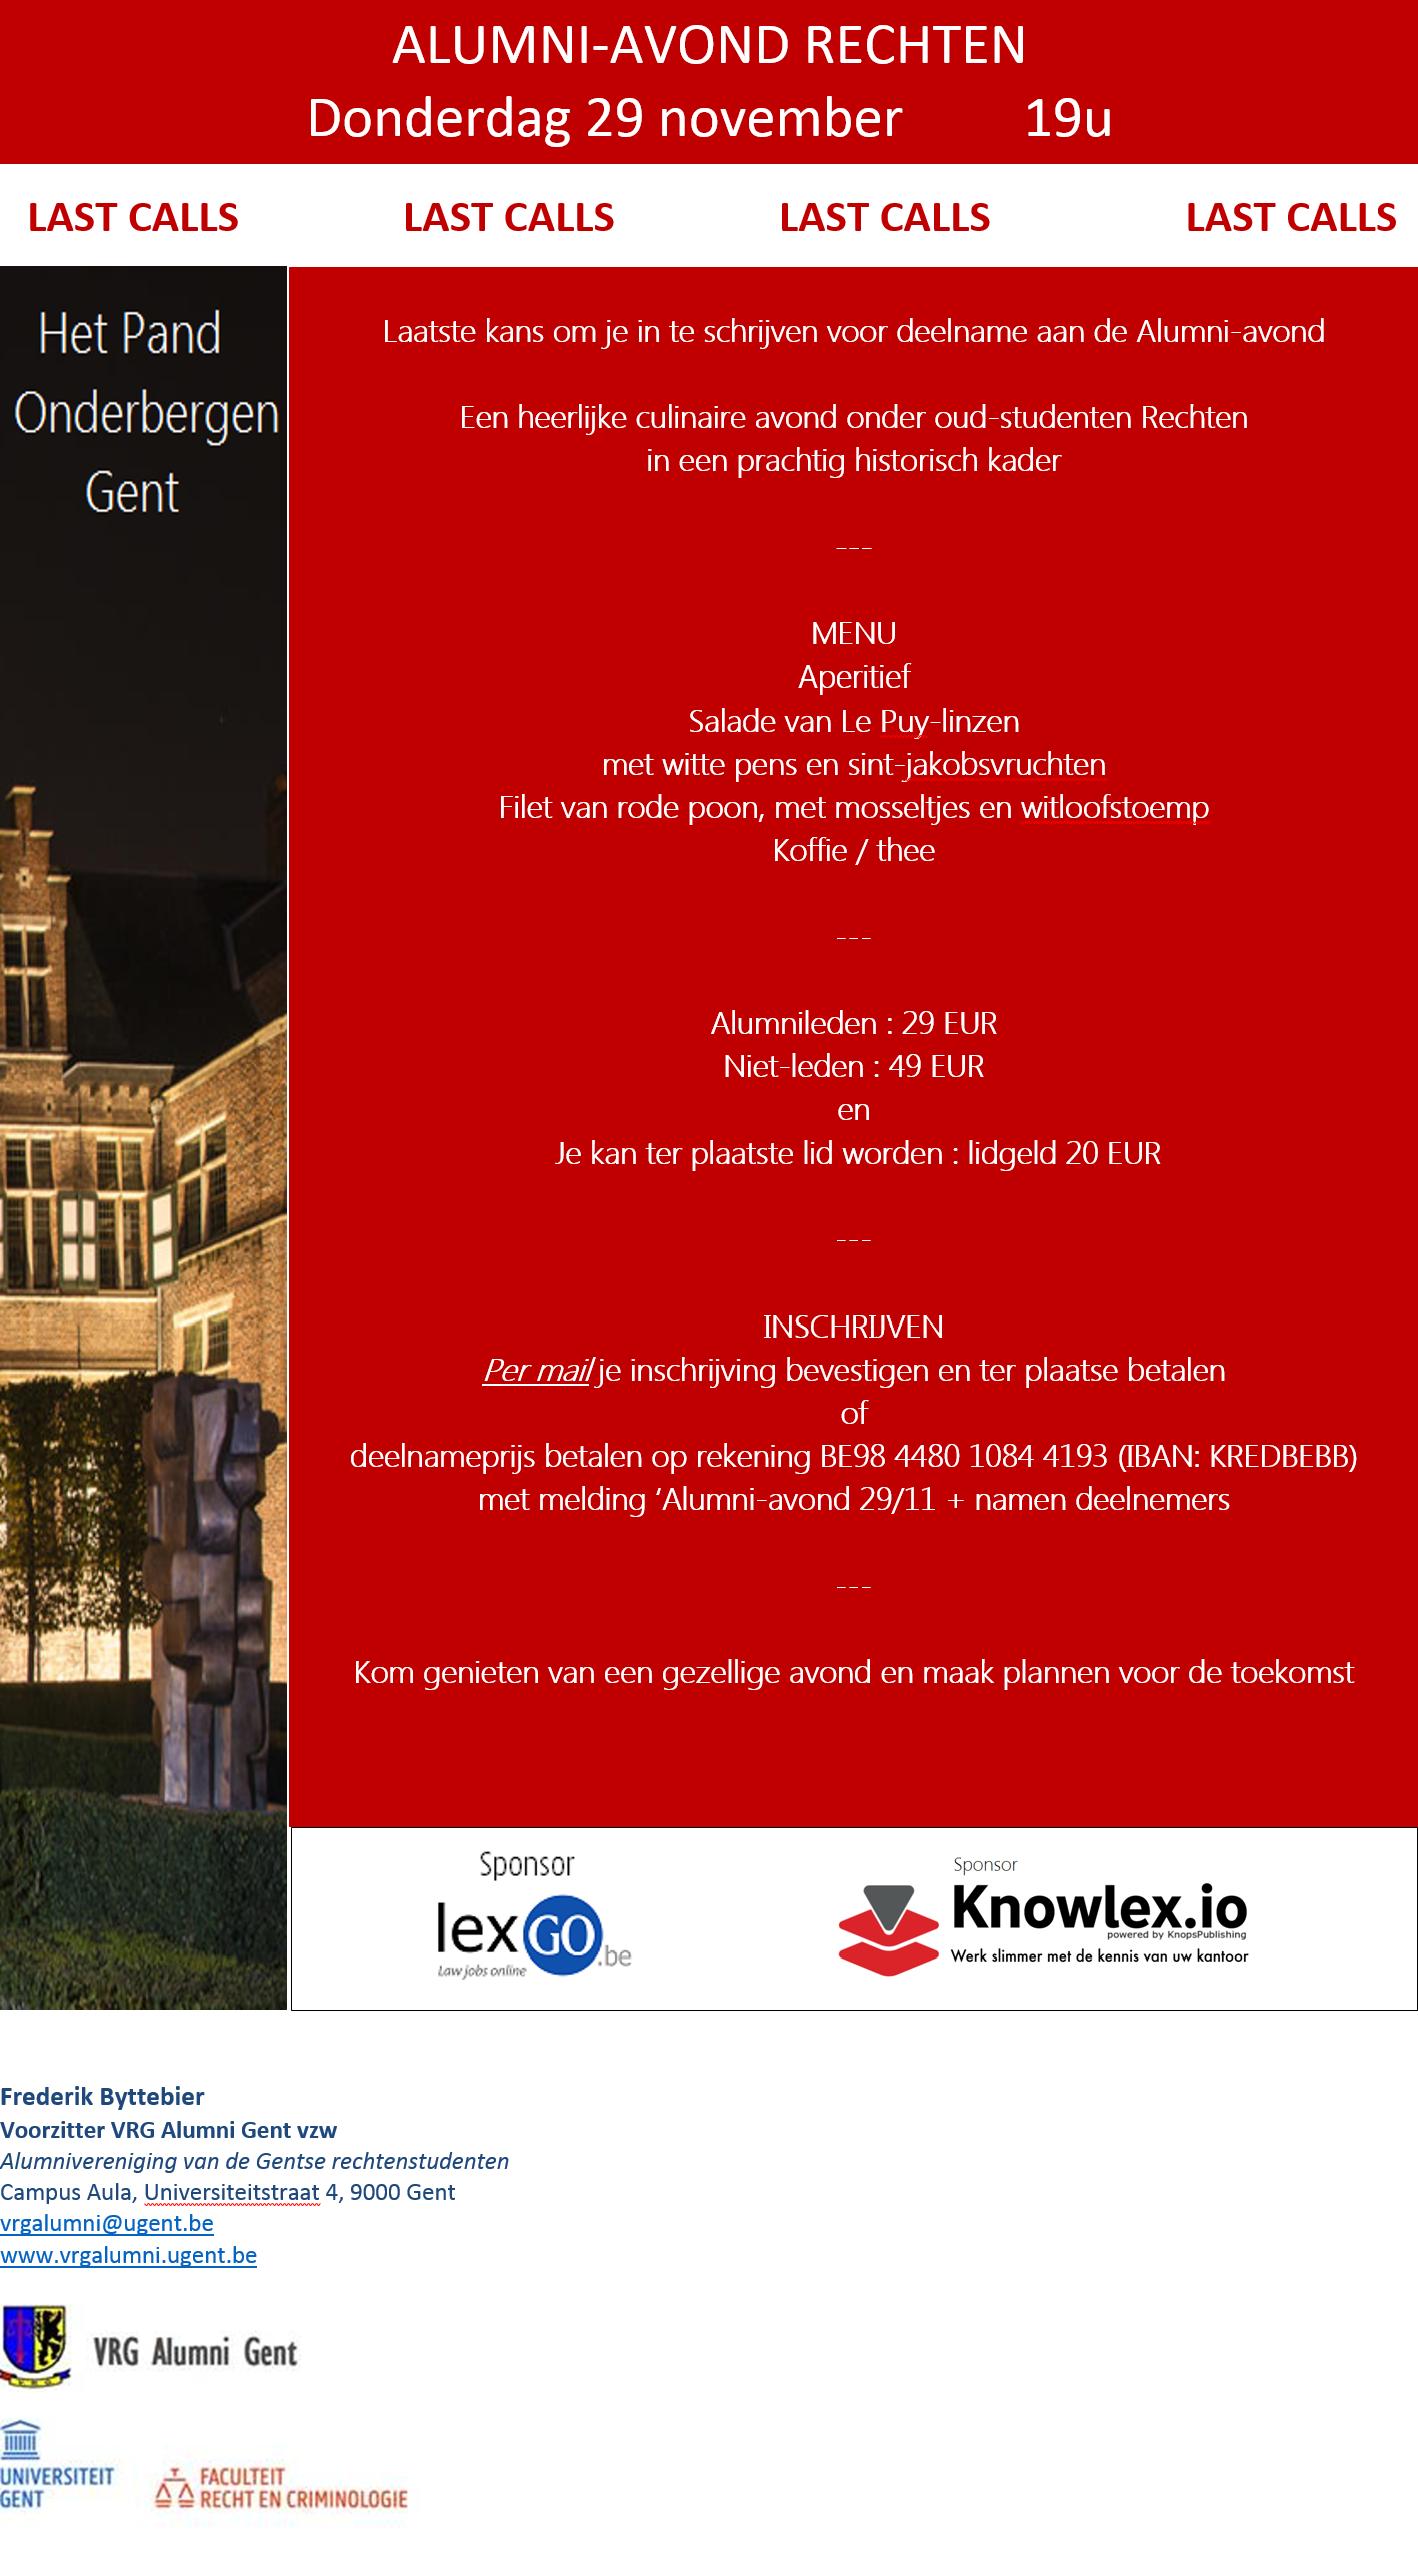 Alumniavond 29 November 2018 - Last calls